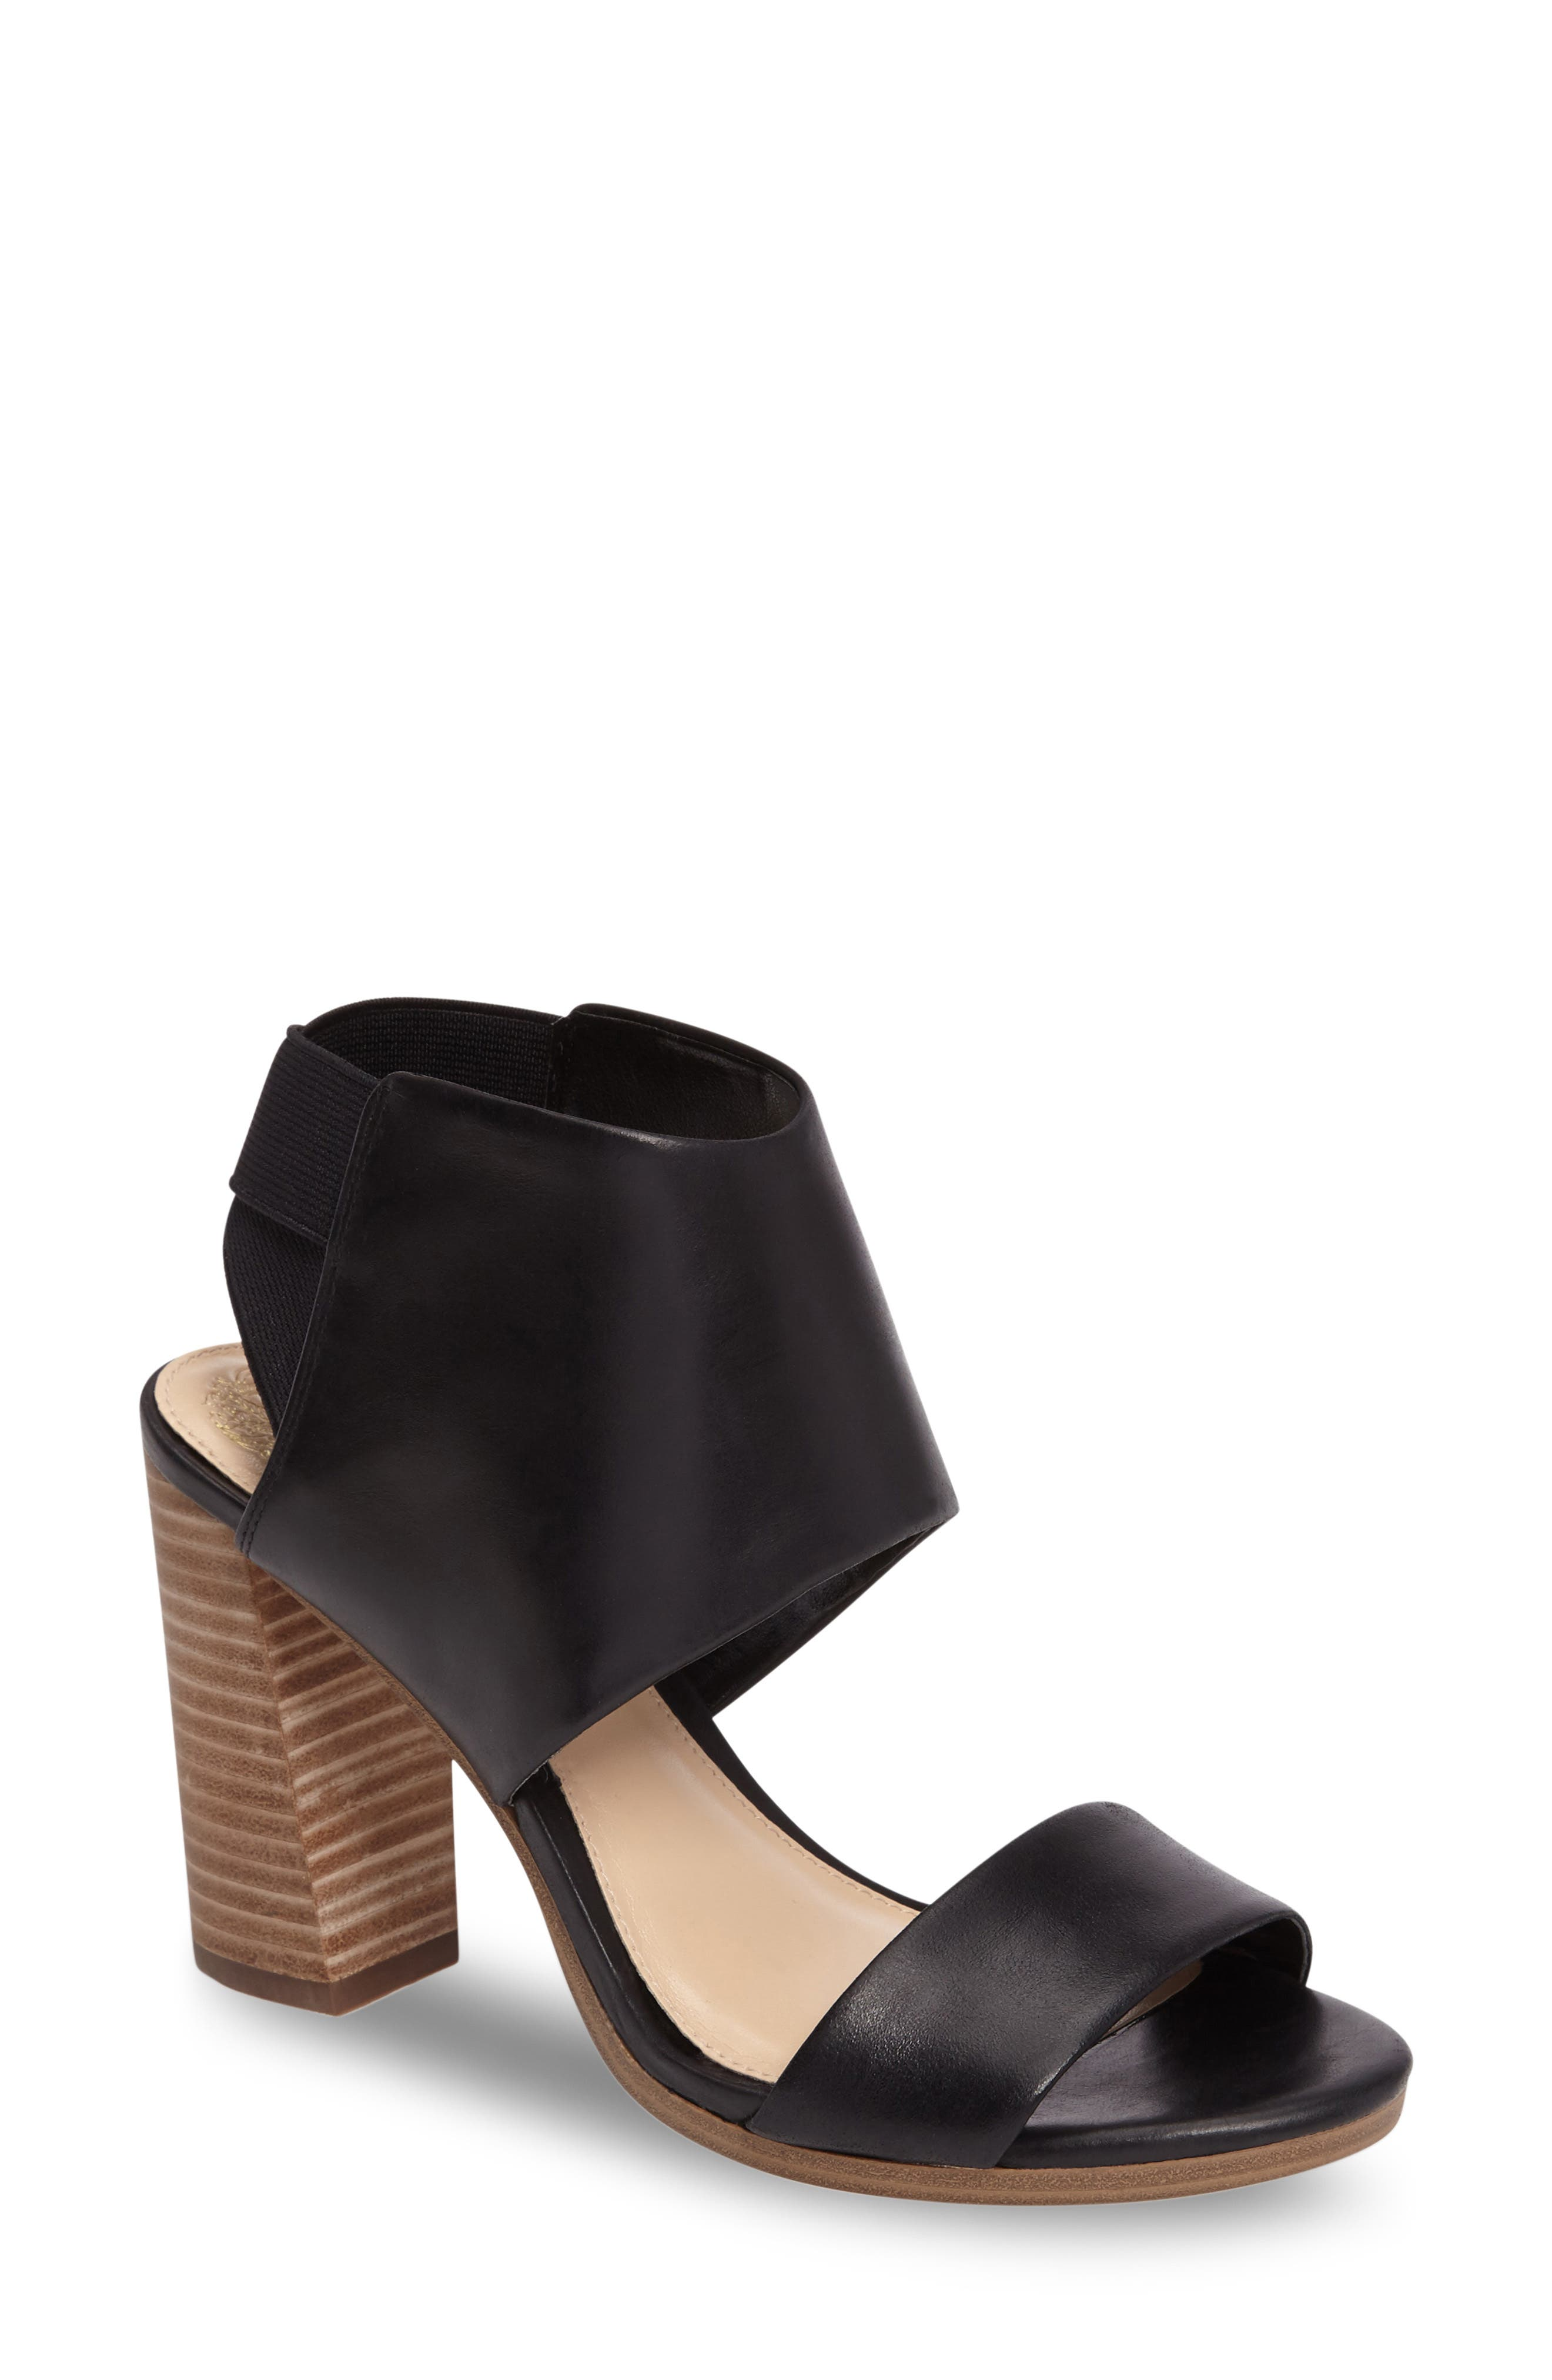 VINCE CAMUTO Keisha Elastic Slingback Sandal